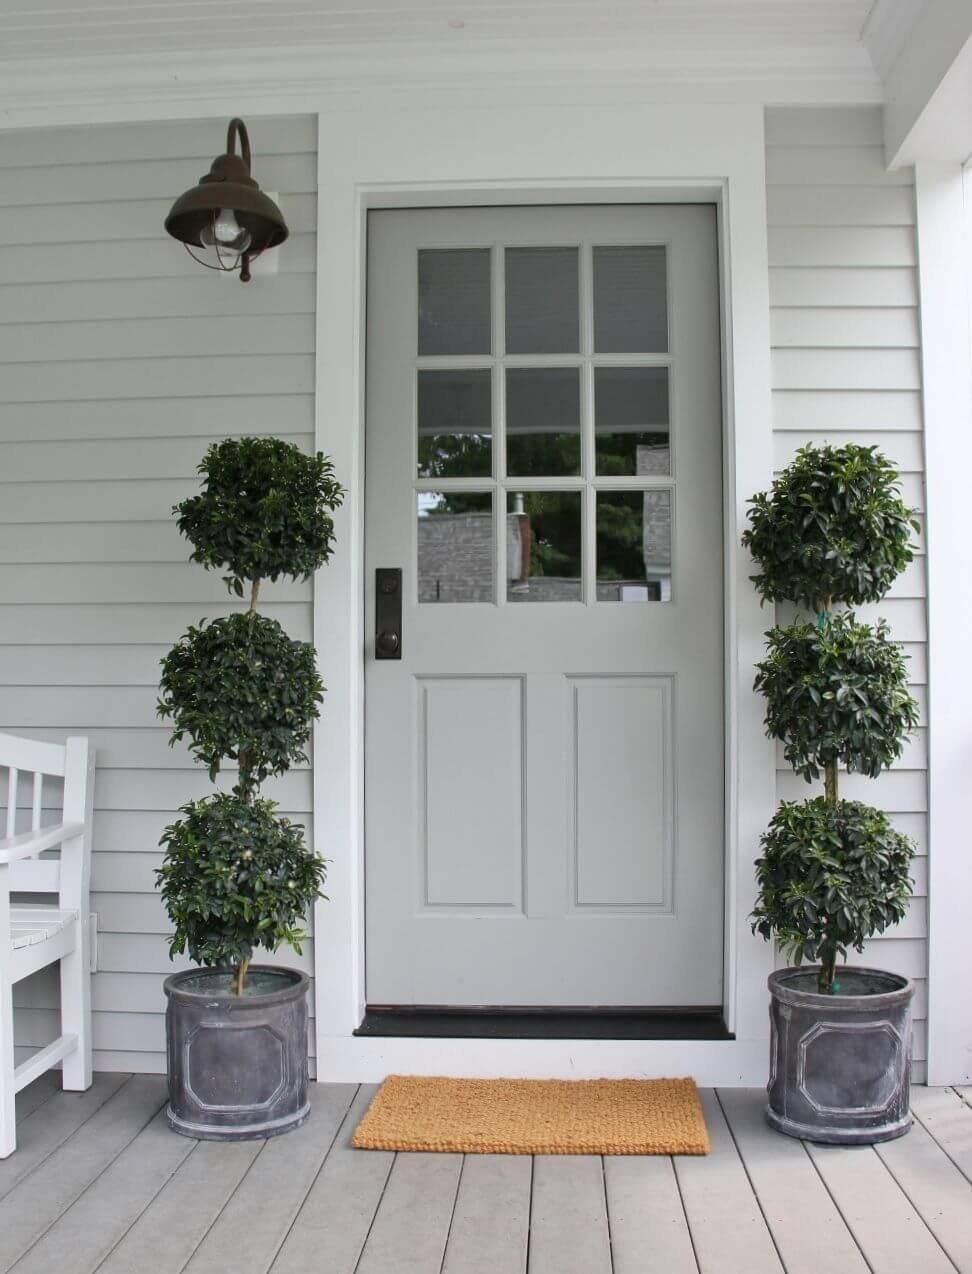 30 Best Front Door Color Ideas and Designs for 2020 on Door Color Ideas  id=26357